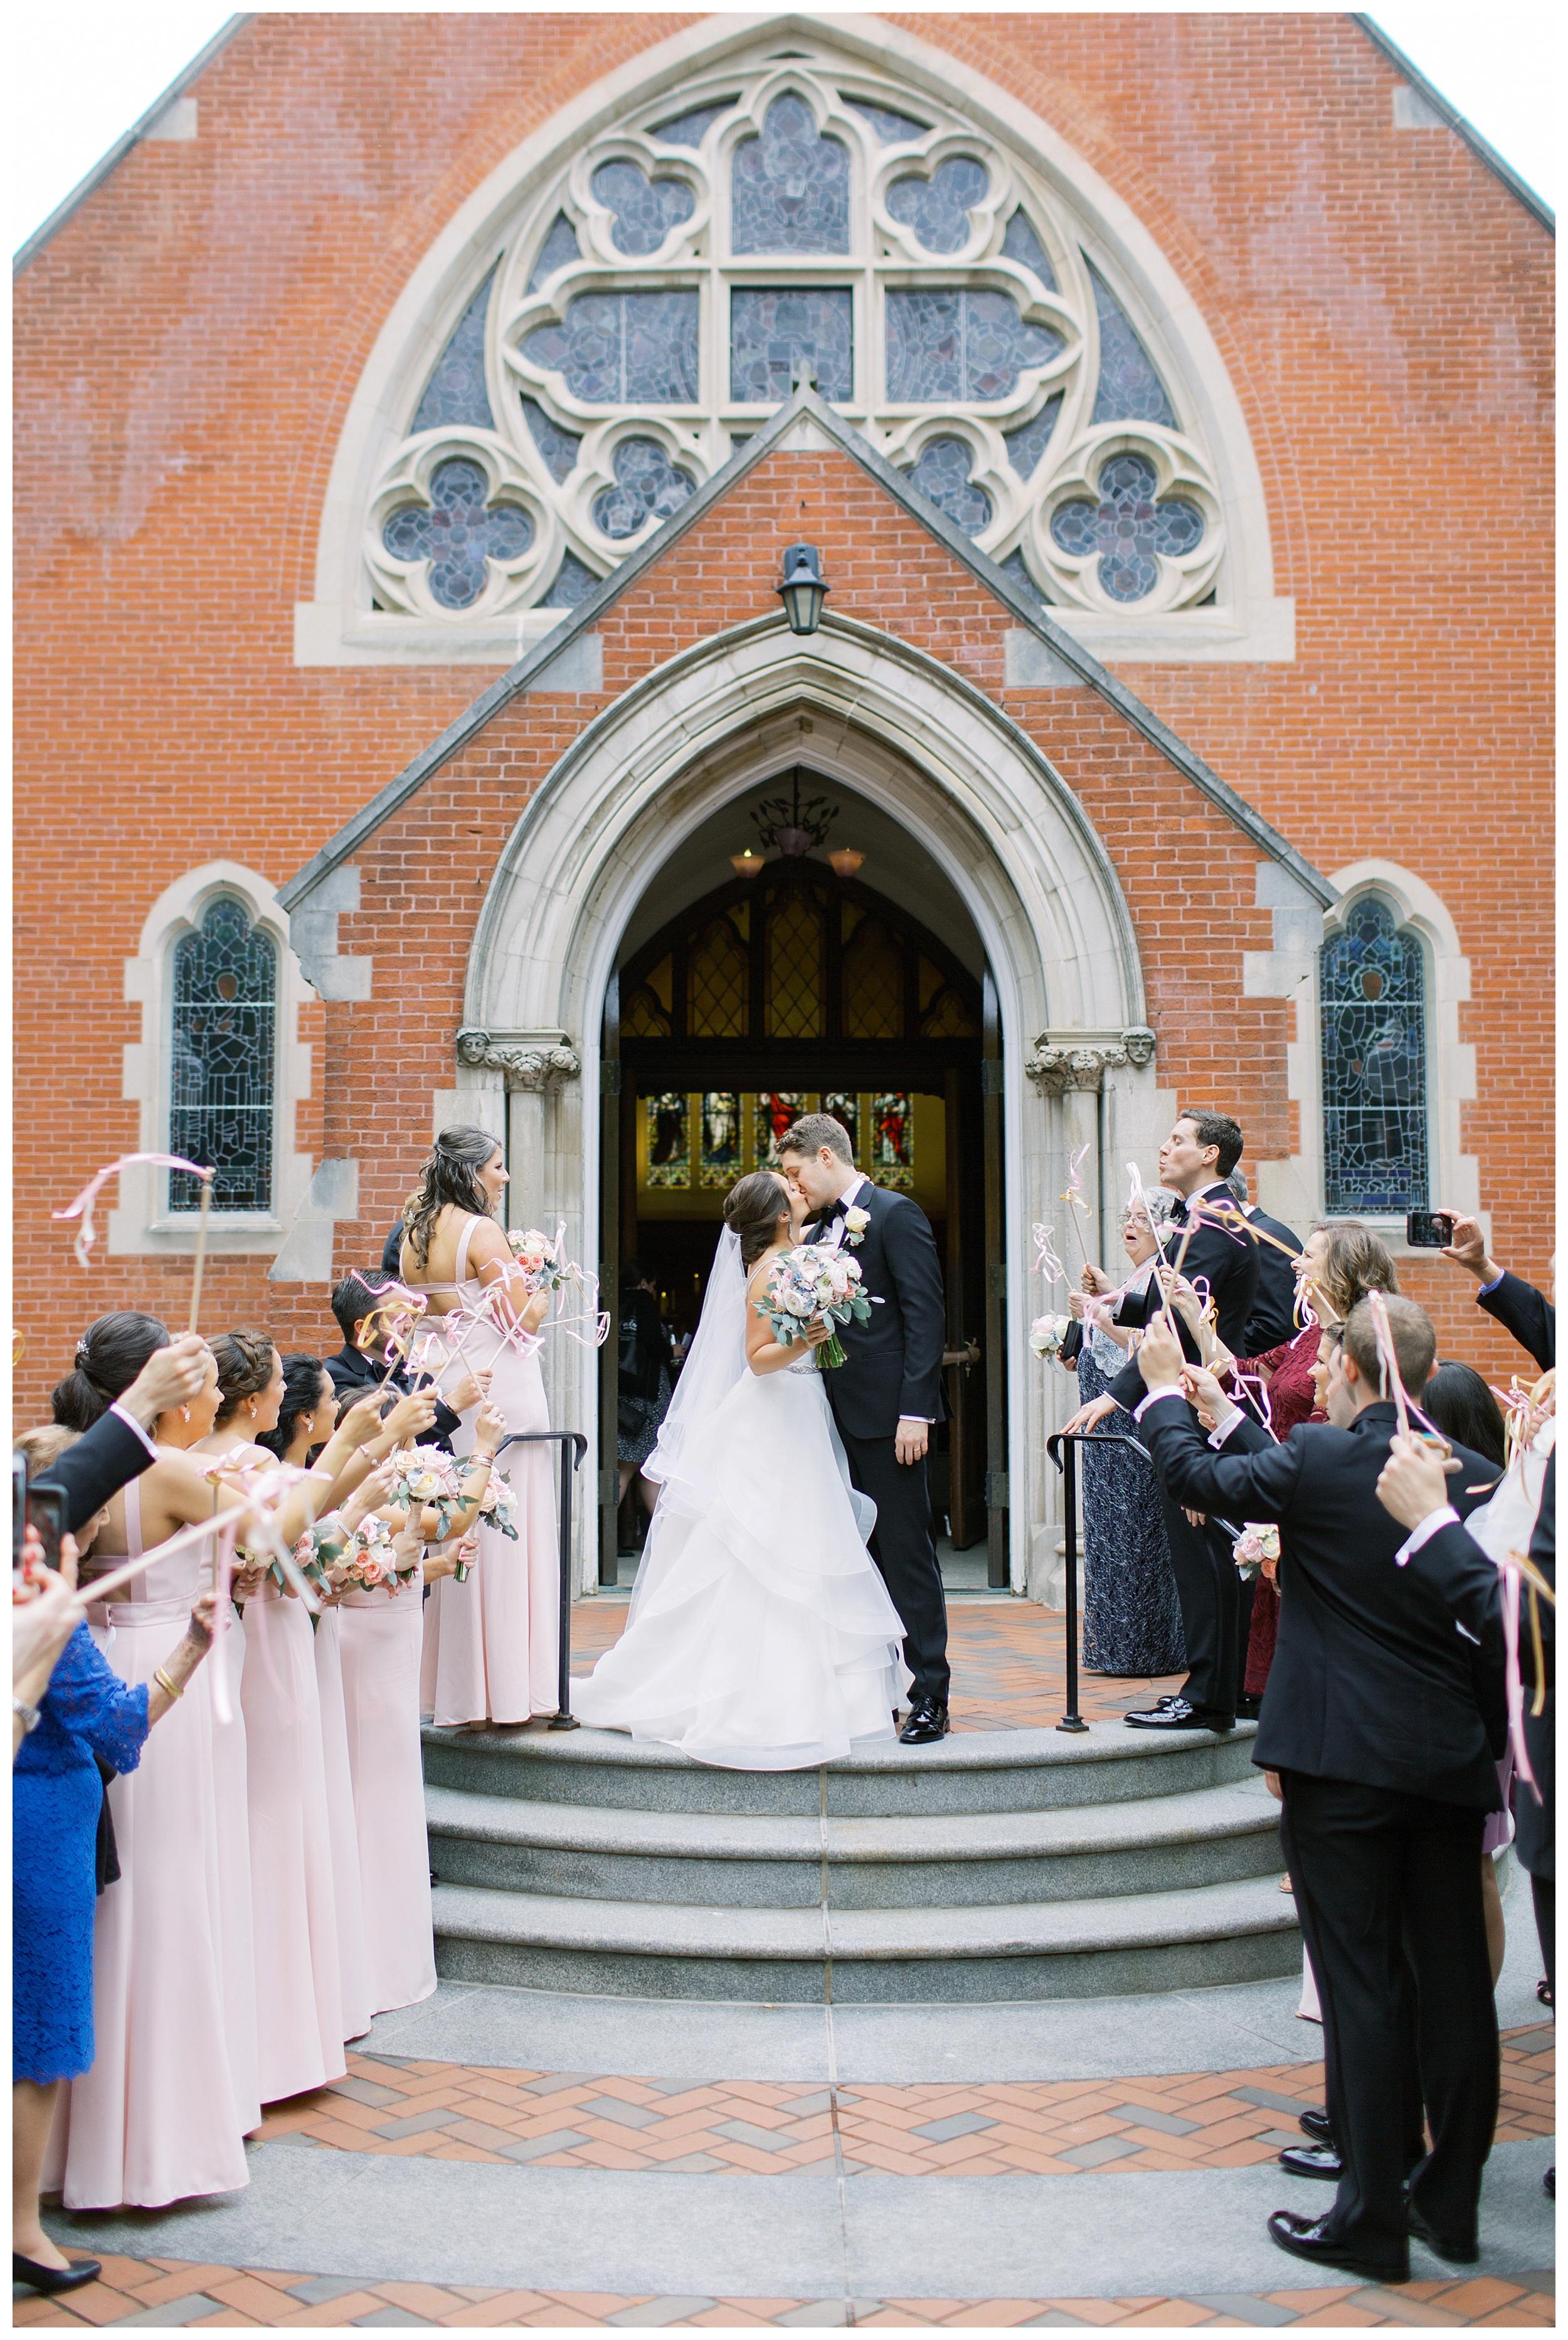 DAR Constitution Hall Wedding Wedding | Daughters of the American Revolution Wedding | District of Columbia Film Wedding Photographer Kir Tuben_0052.jpg